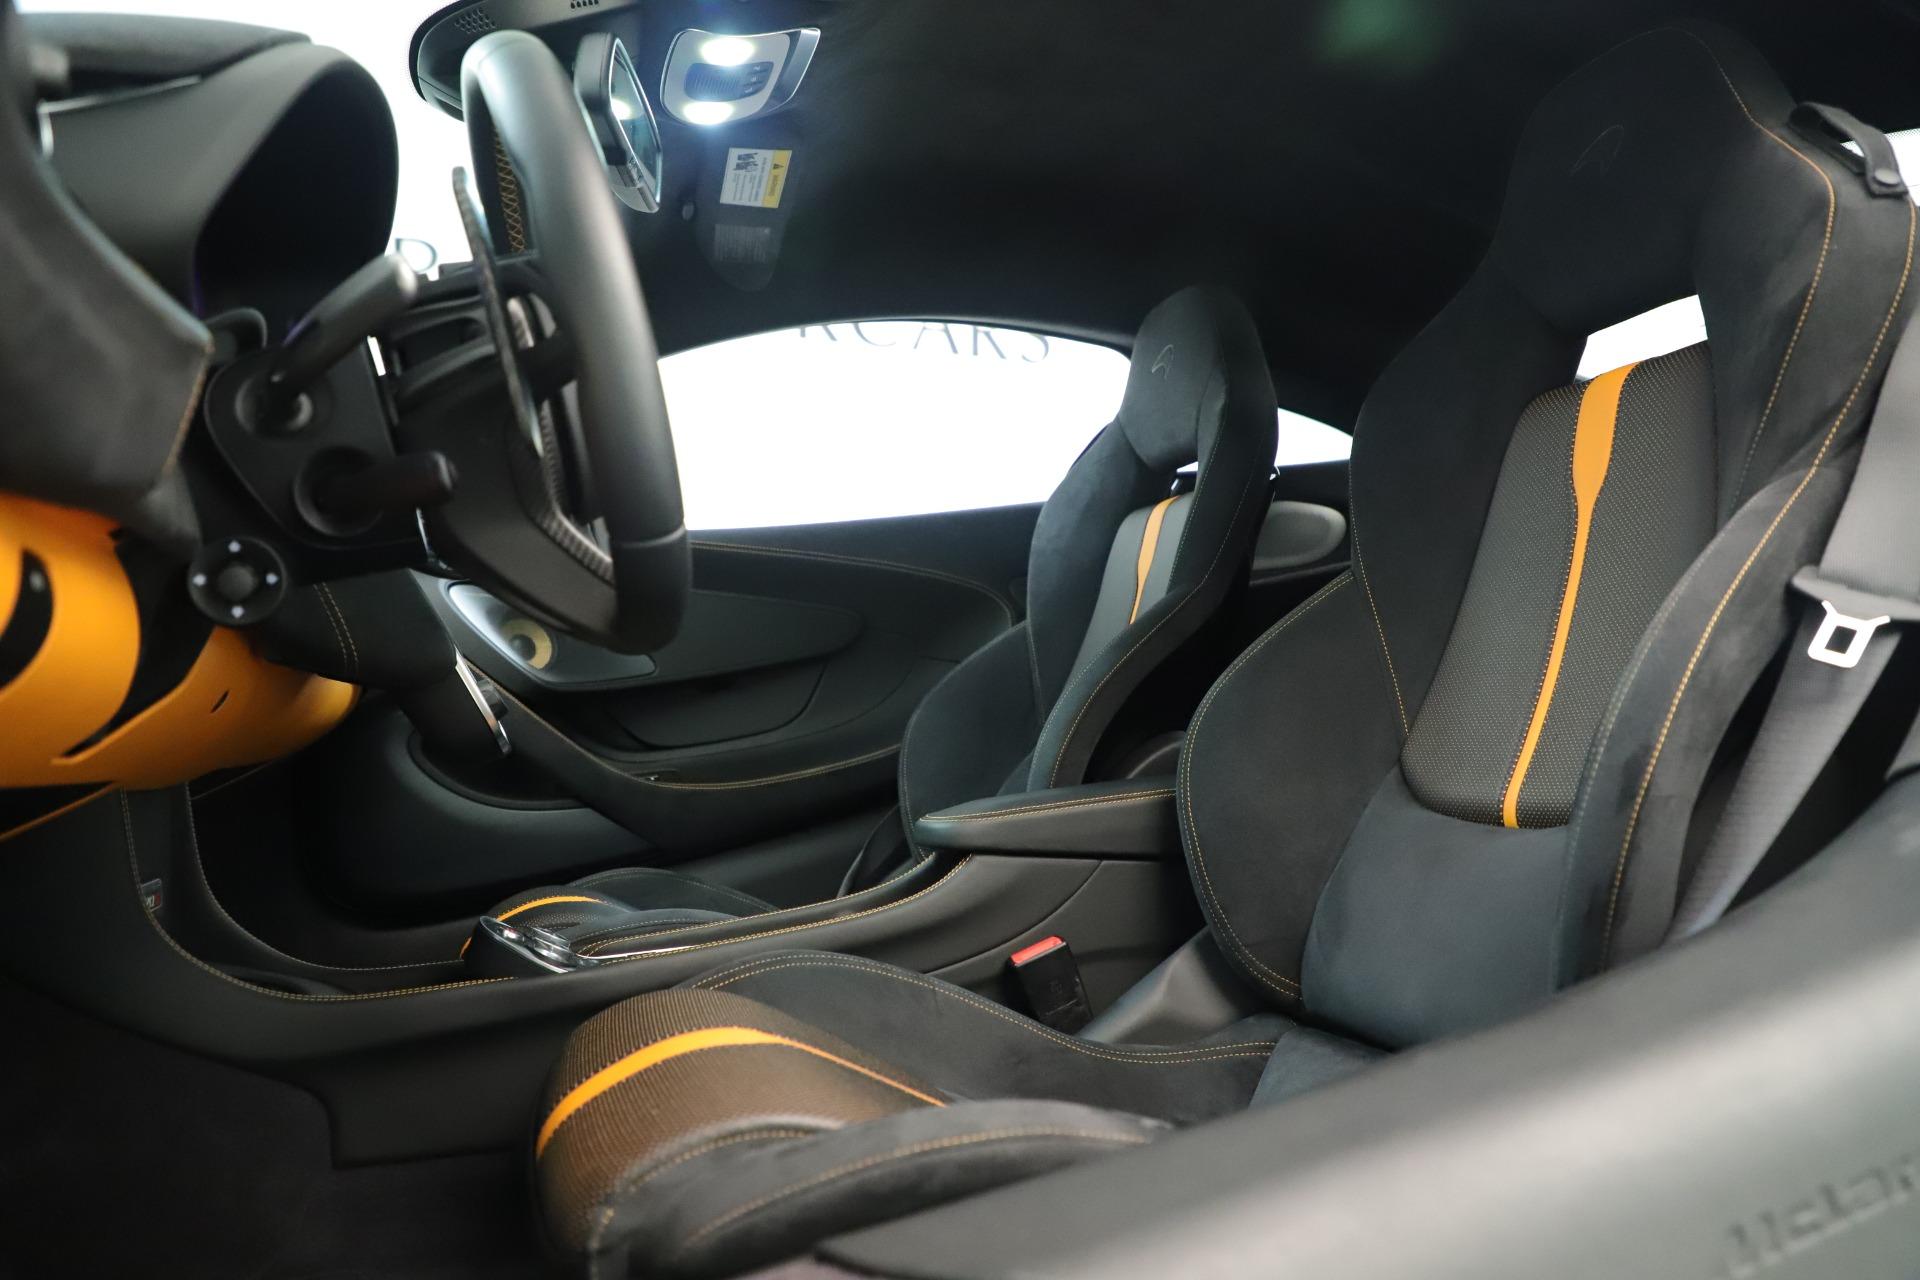 Used 2016 McLaren 570S Coupe For Sale In Westport, CT 3433_p15